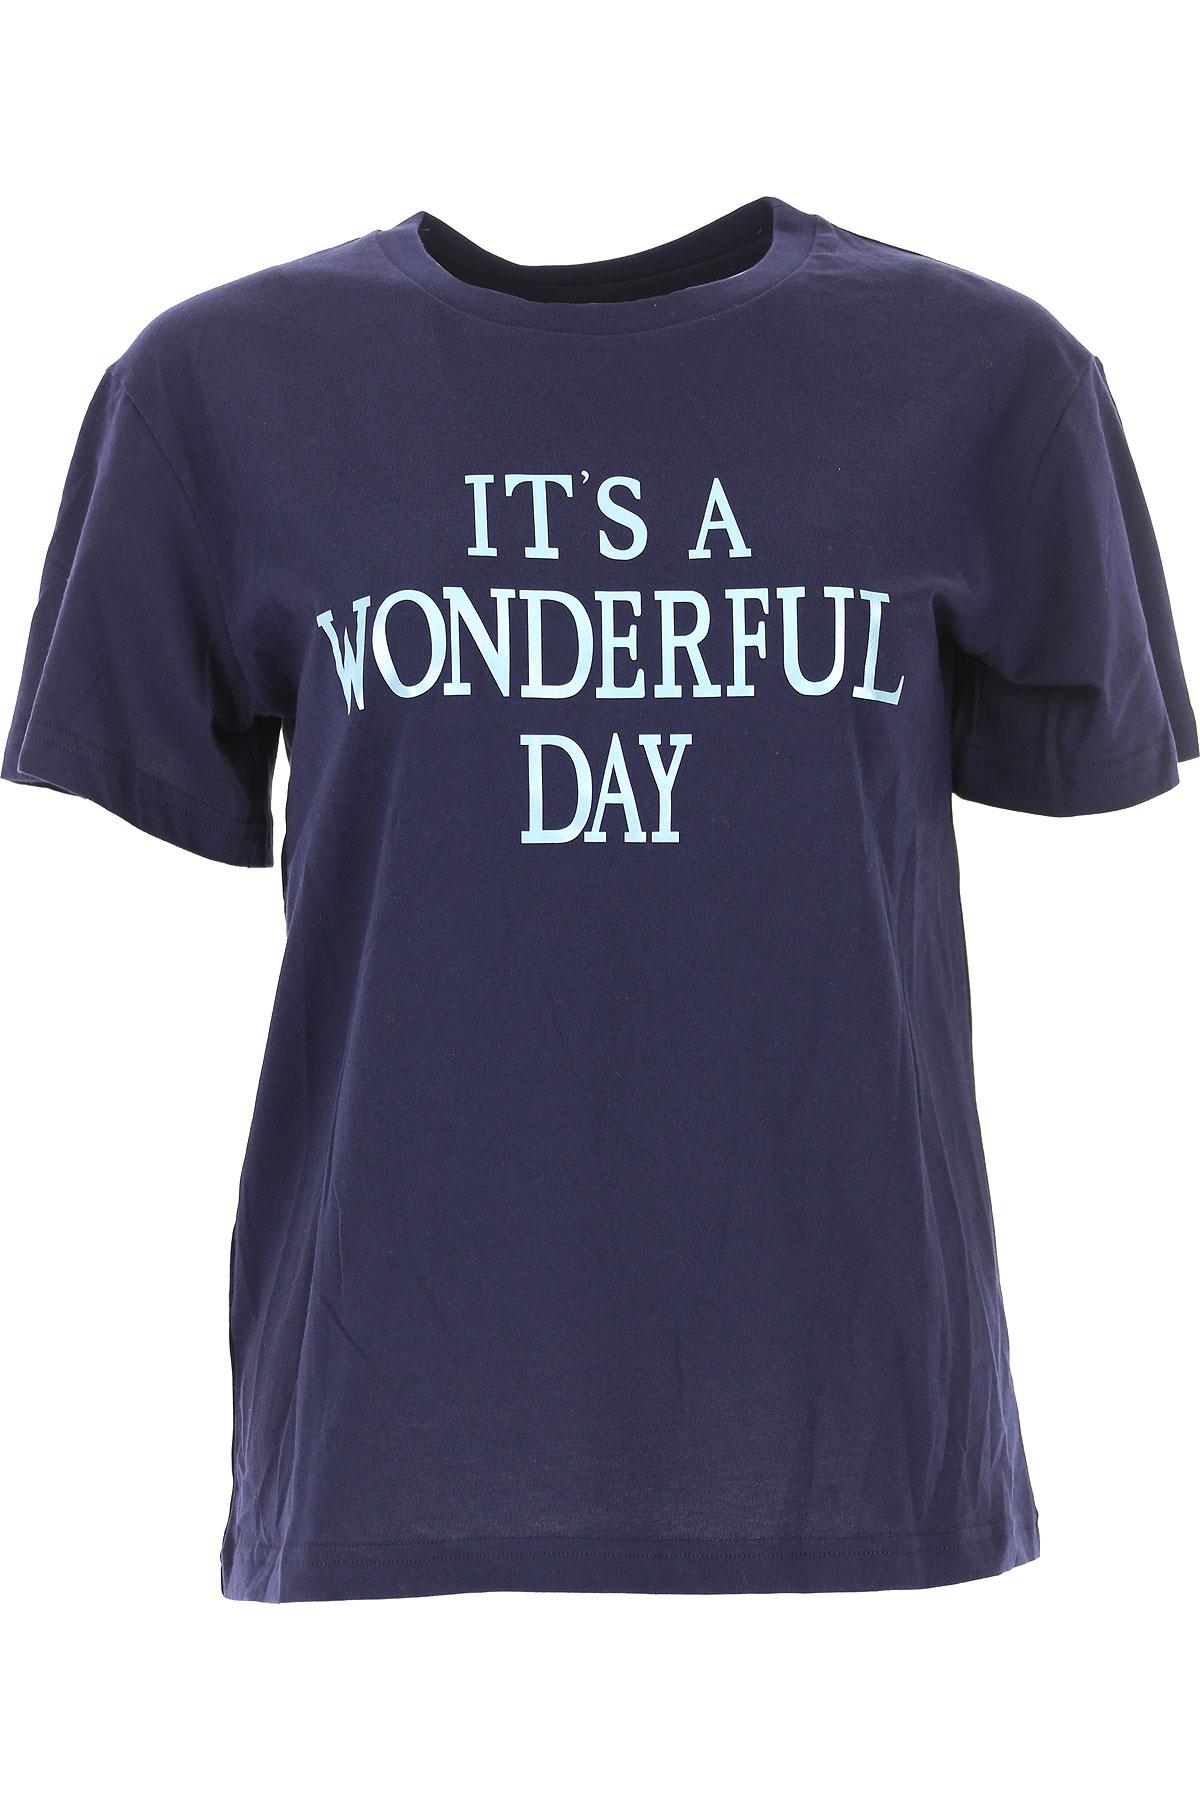 Image of Alberta Ferretti T-Shirt for Women, Blue Navy, Cotton, 2017, 2 4 6